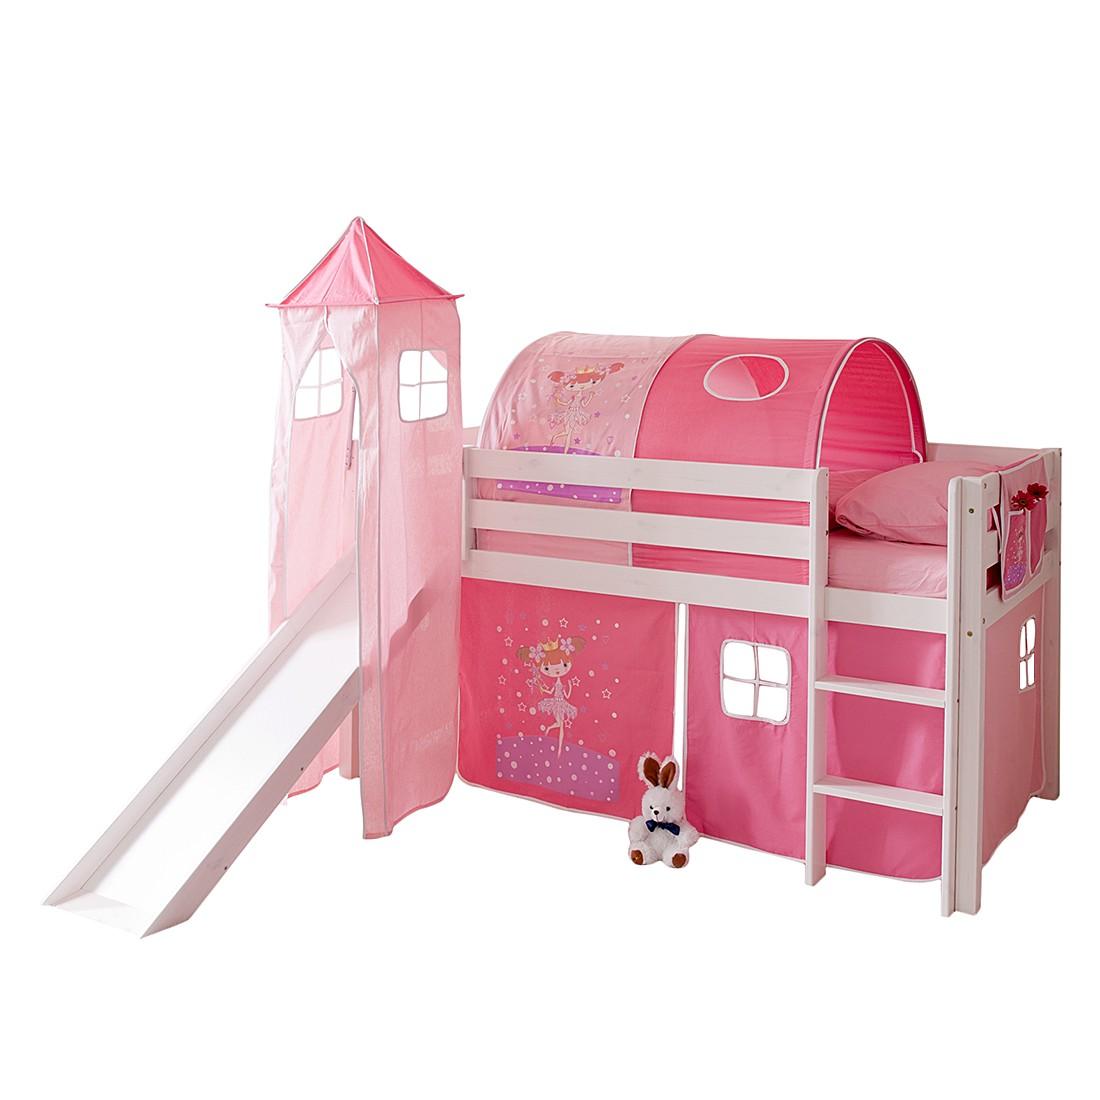 Home 24 - Lit ludique kasper ii - pin massif rose / vif avec tunnel, ticaa